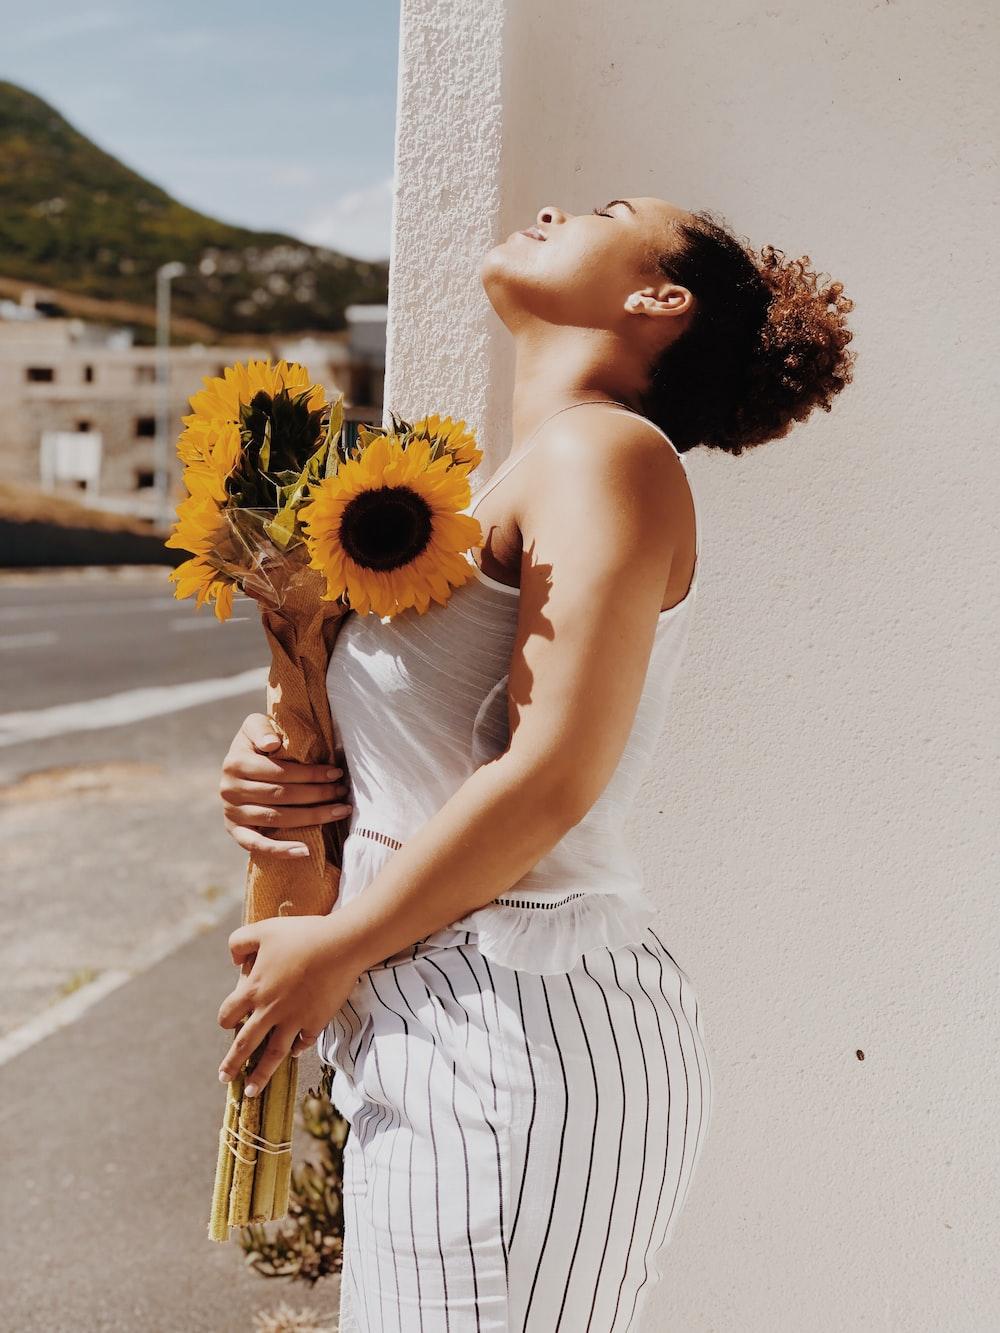 woman holding sunflower in vase